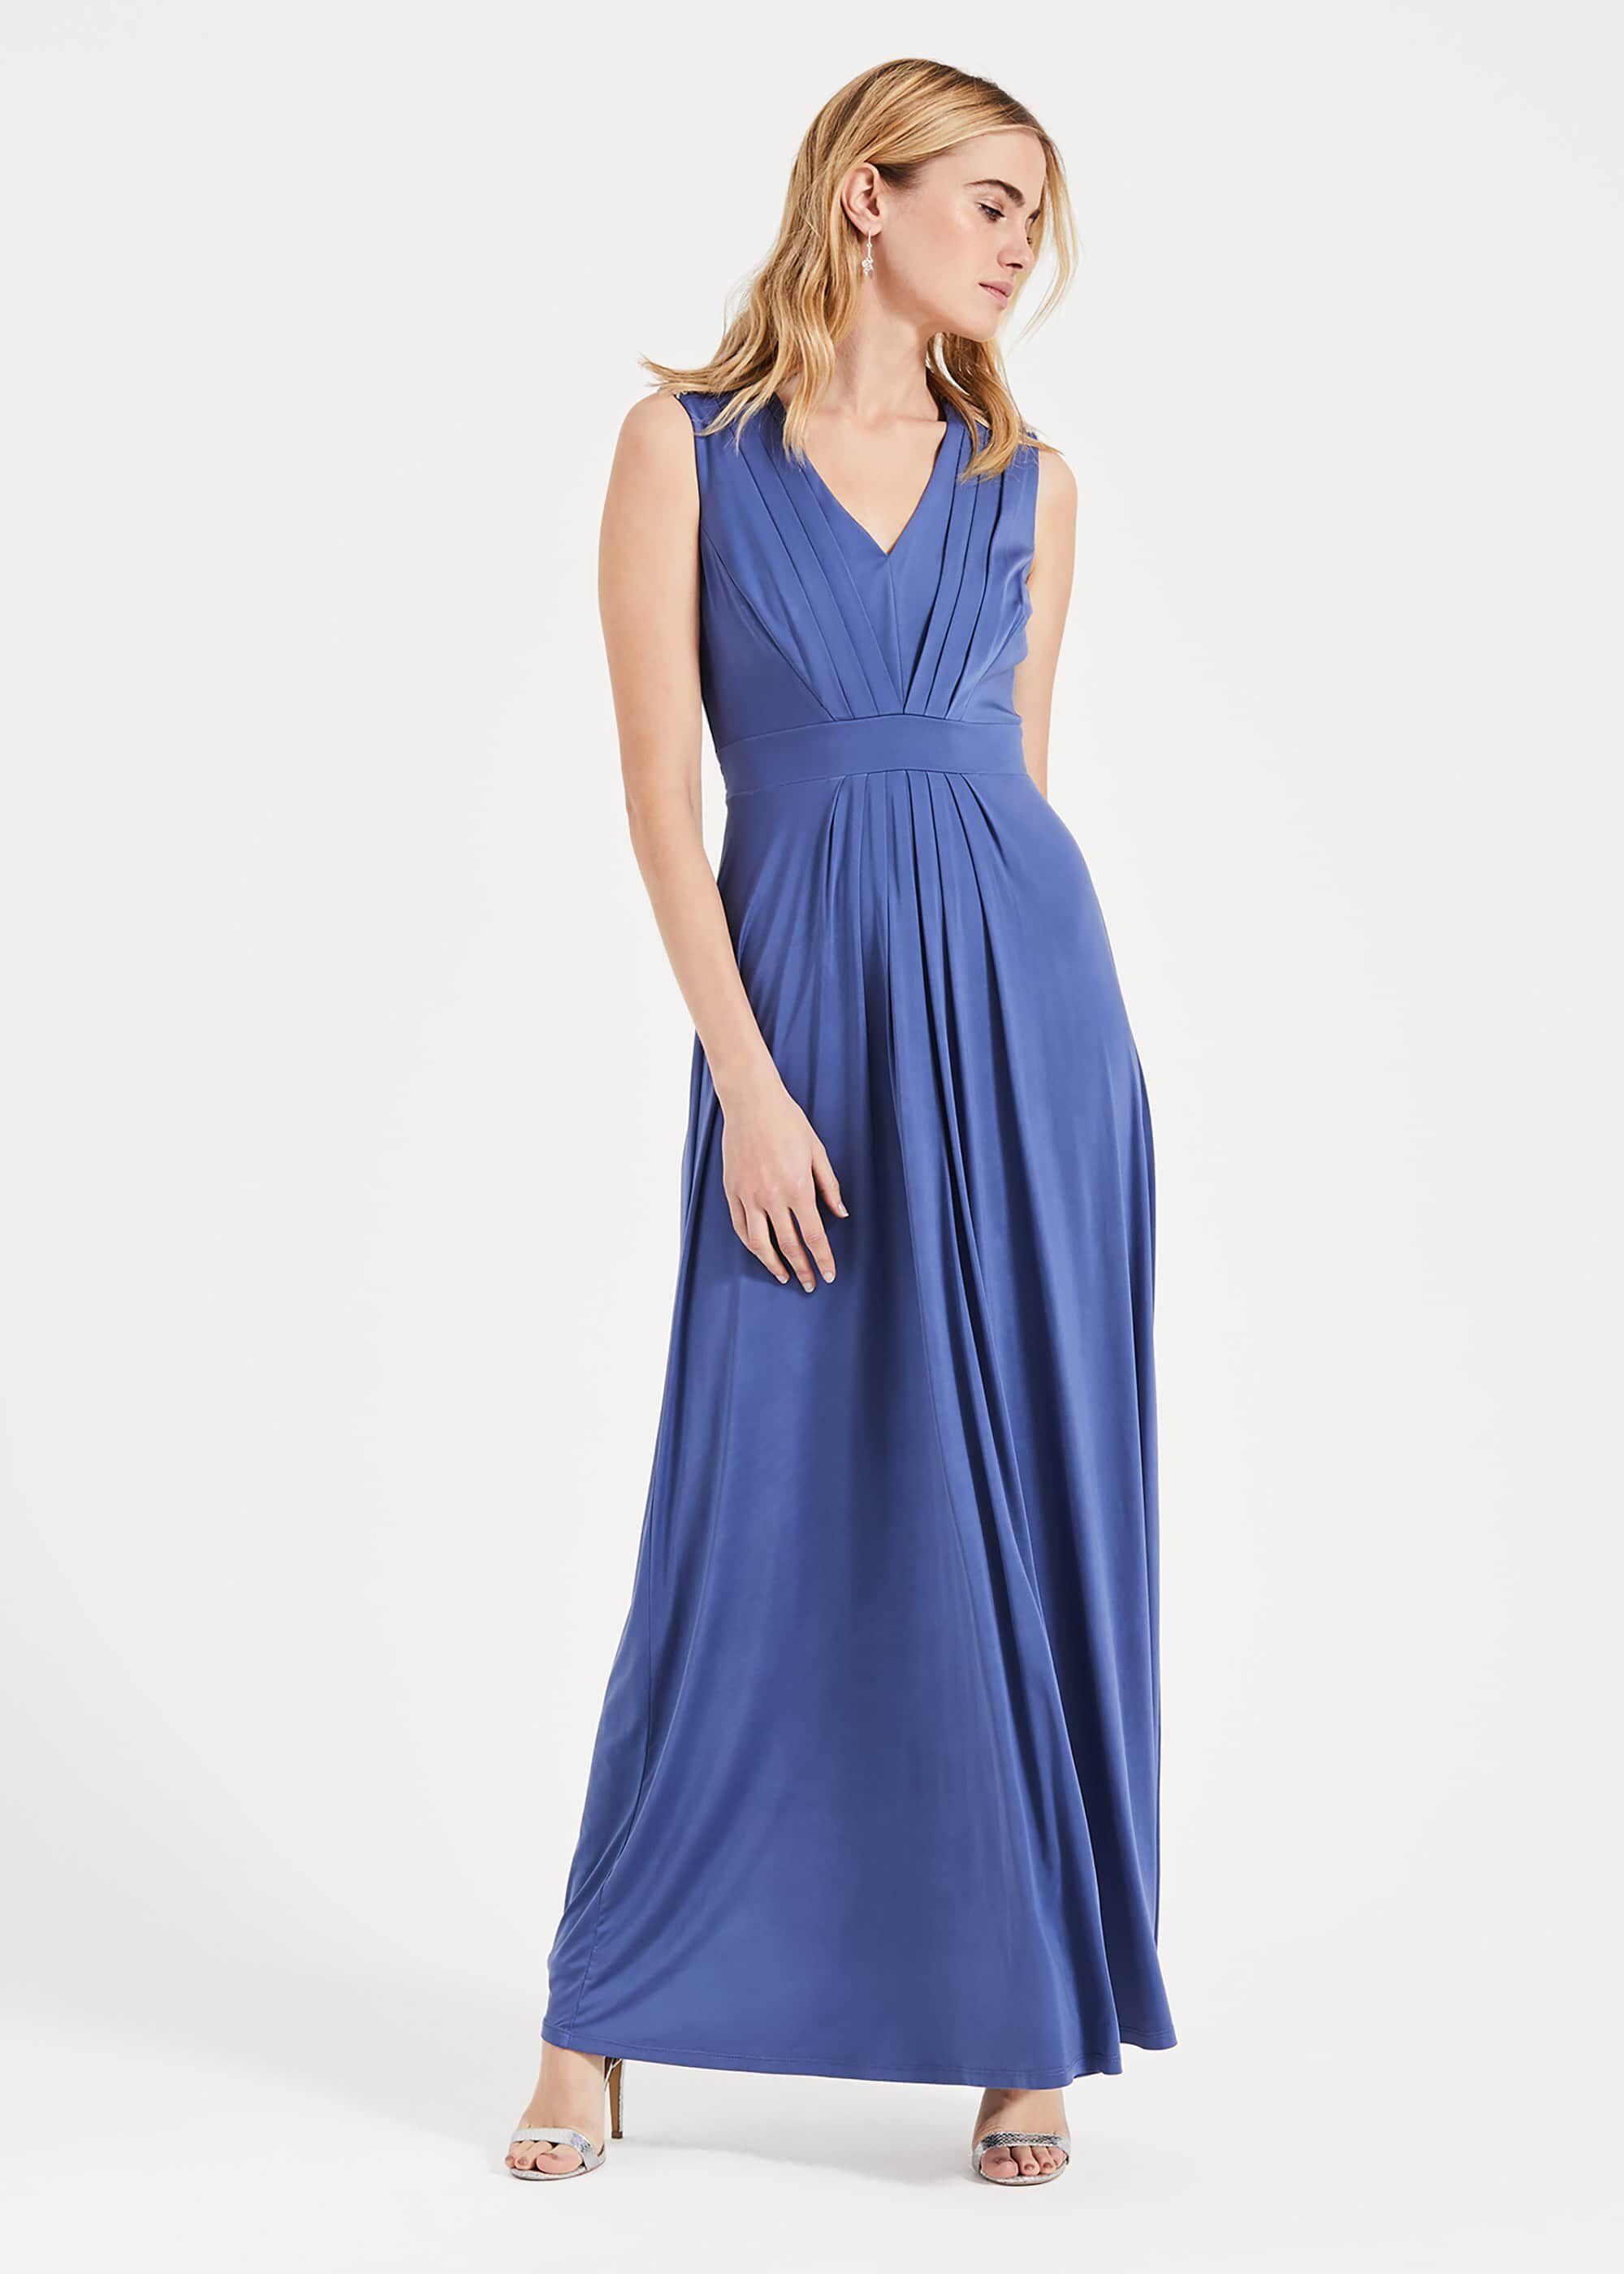 Bridesmaid Dresses | Short & Long Dresses